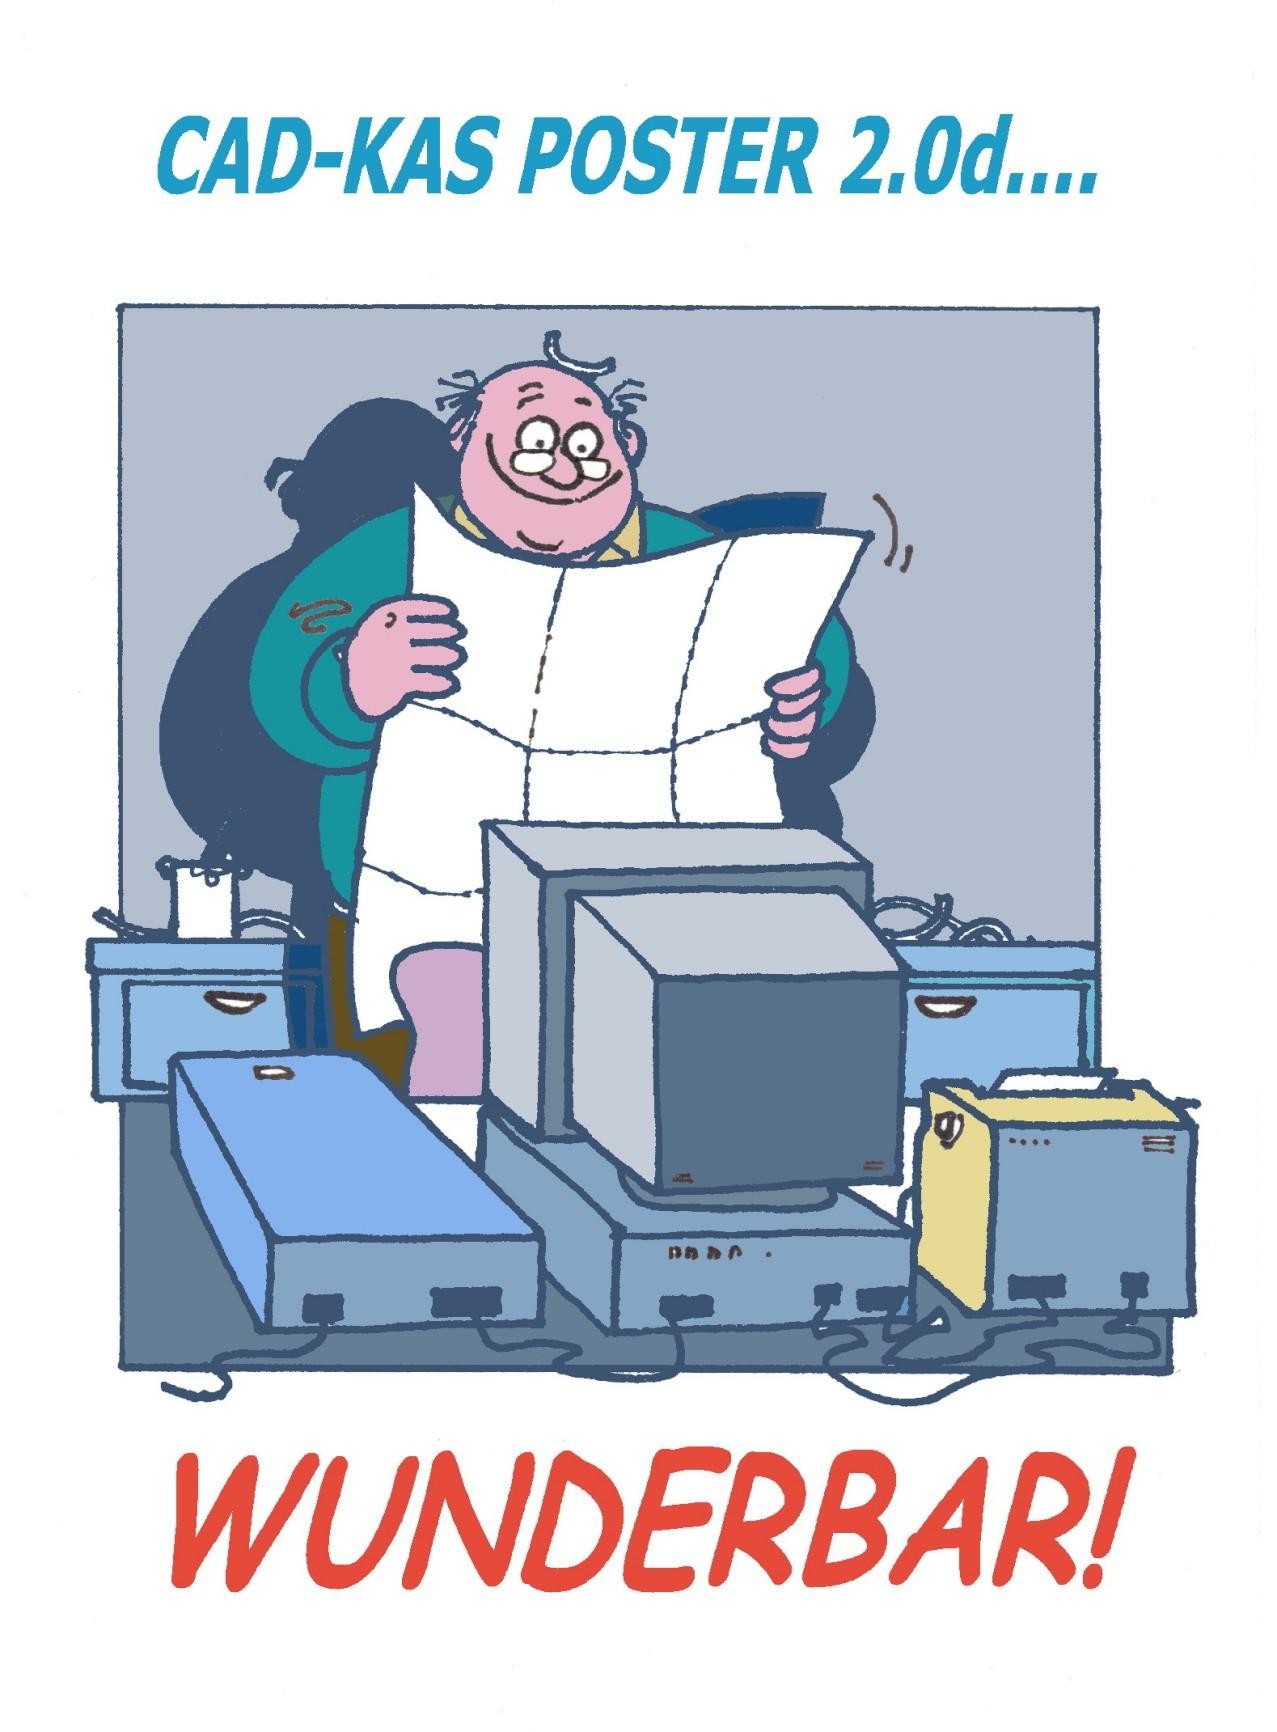 Kalender 2019 Excel Svensk Más Arriba-a-fecha Poster Drucker Selbst Poster Drucken original Von Cad Kas